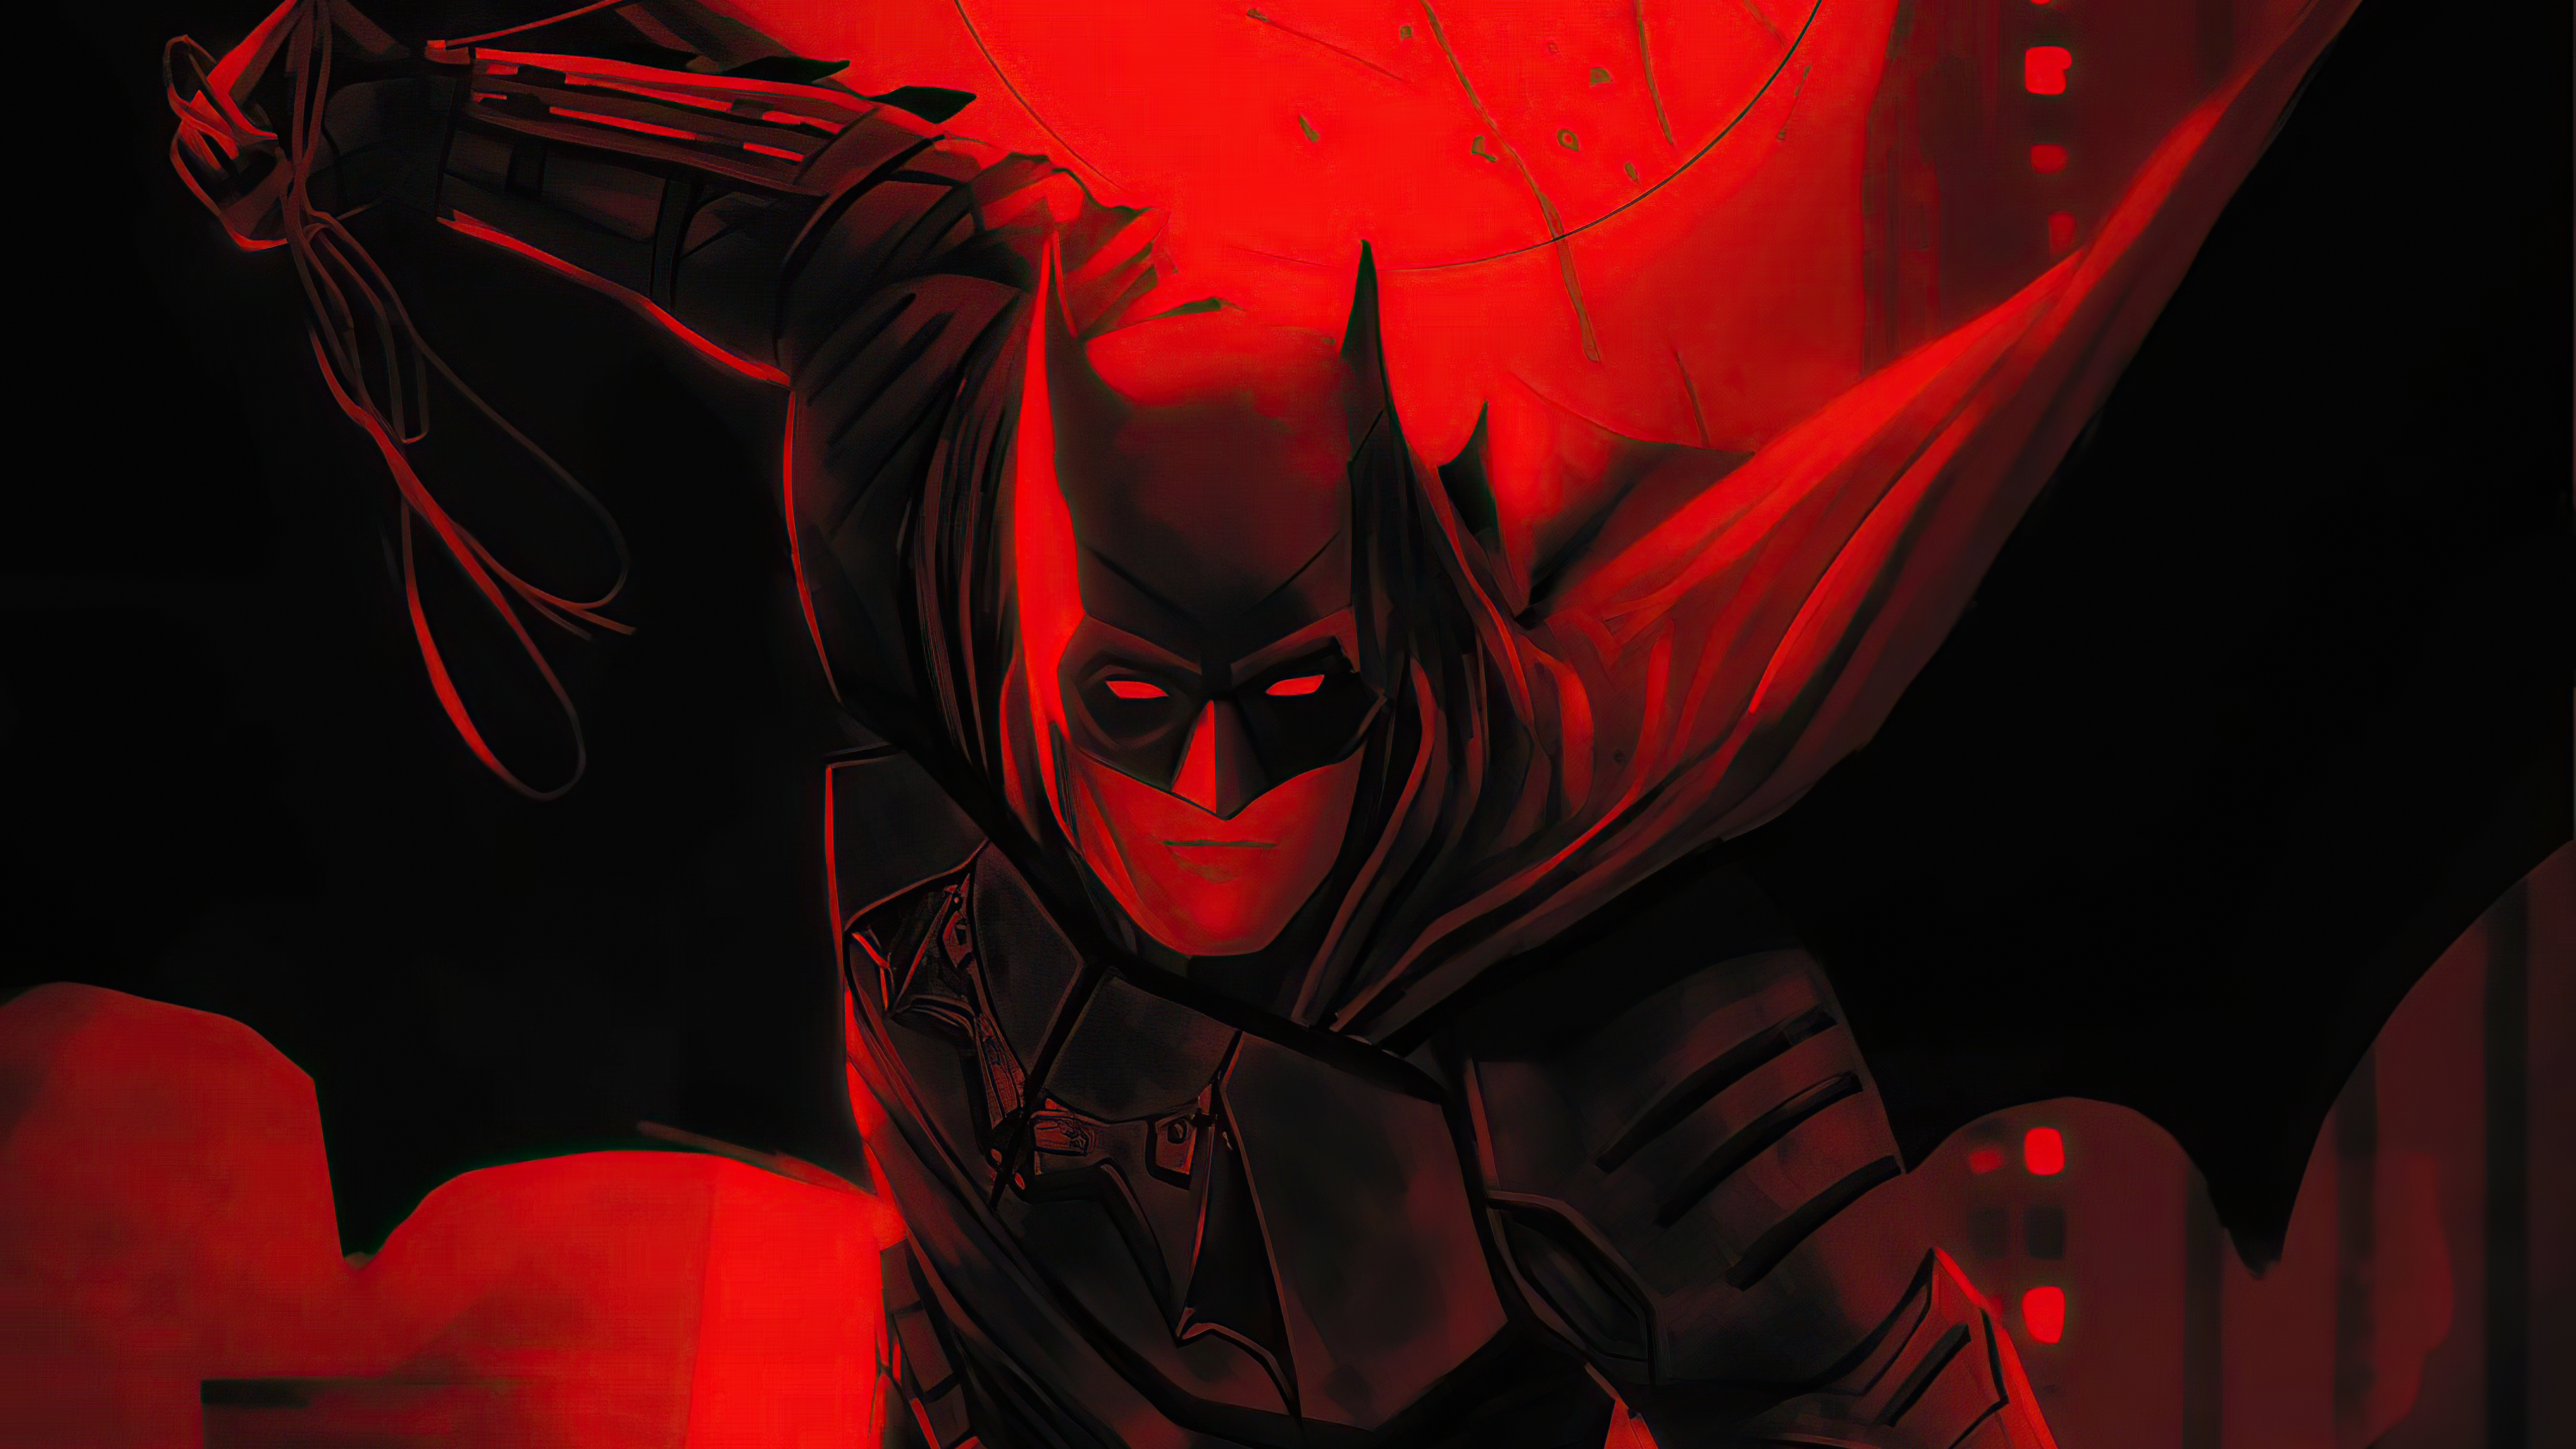 Fondos de pantalla The Batman Flama roja